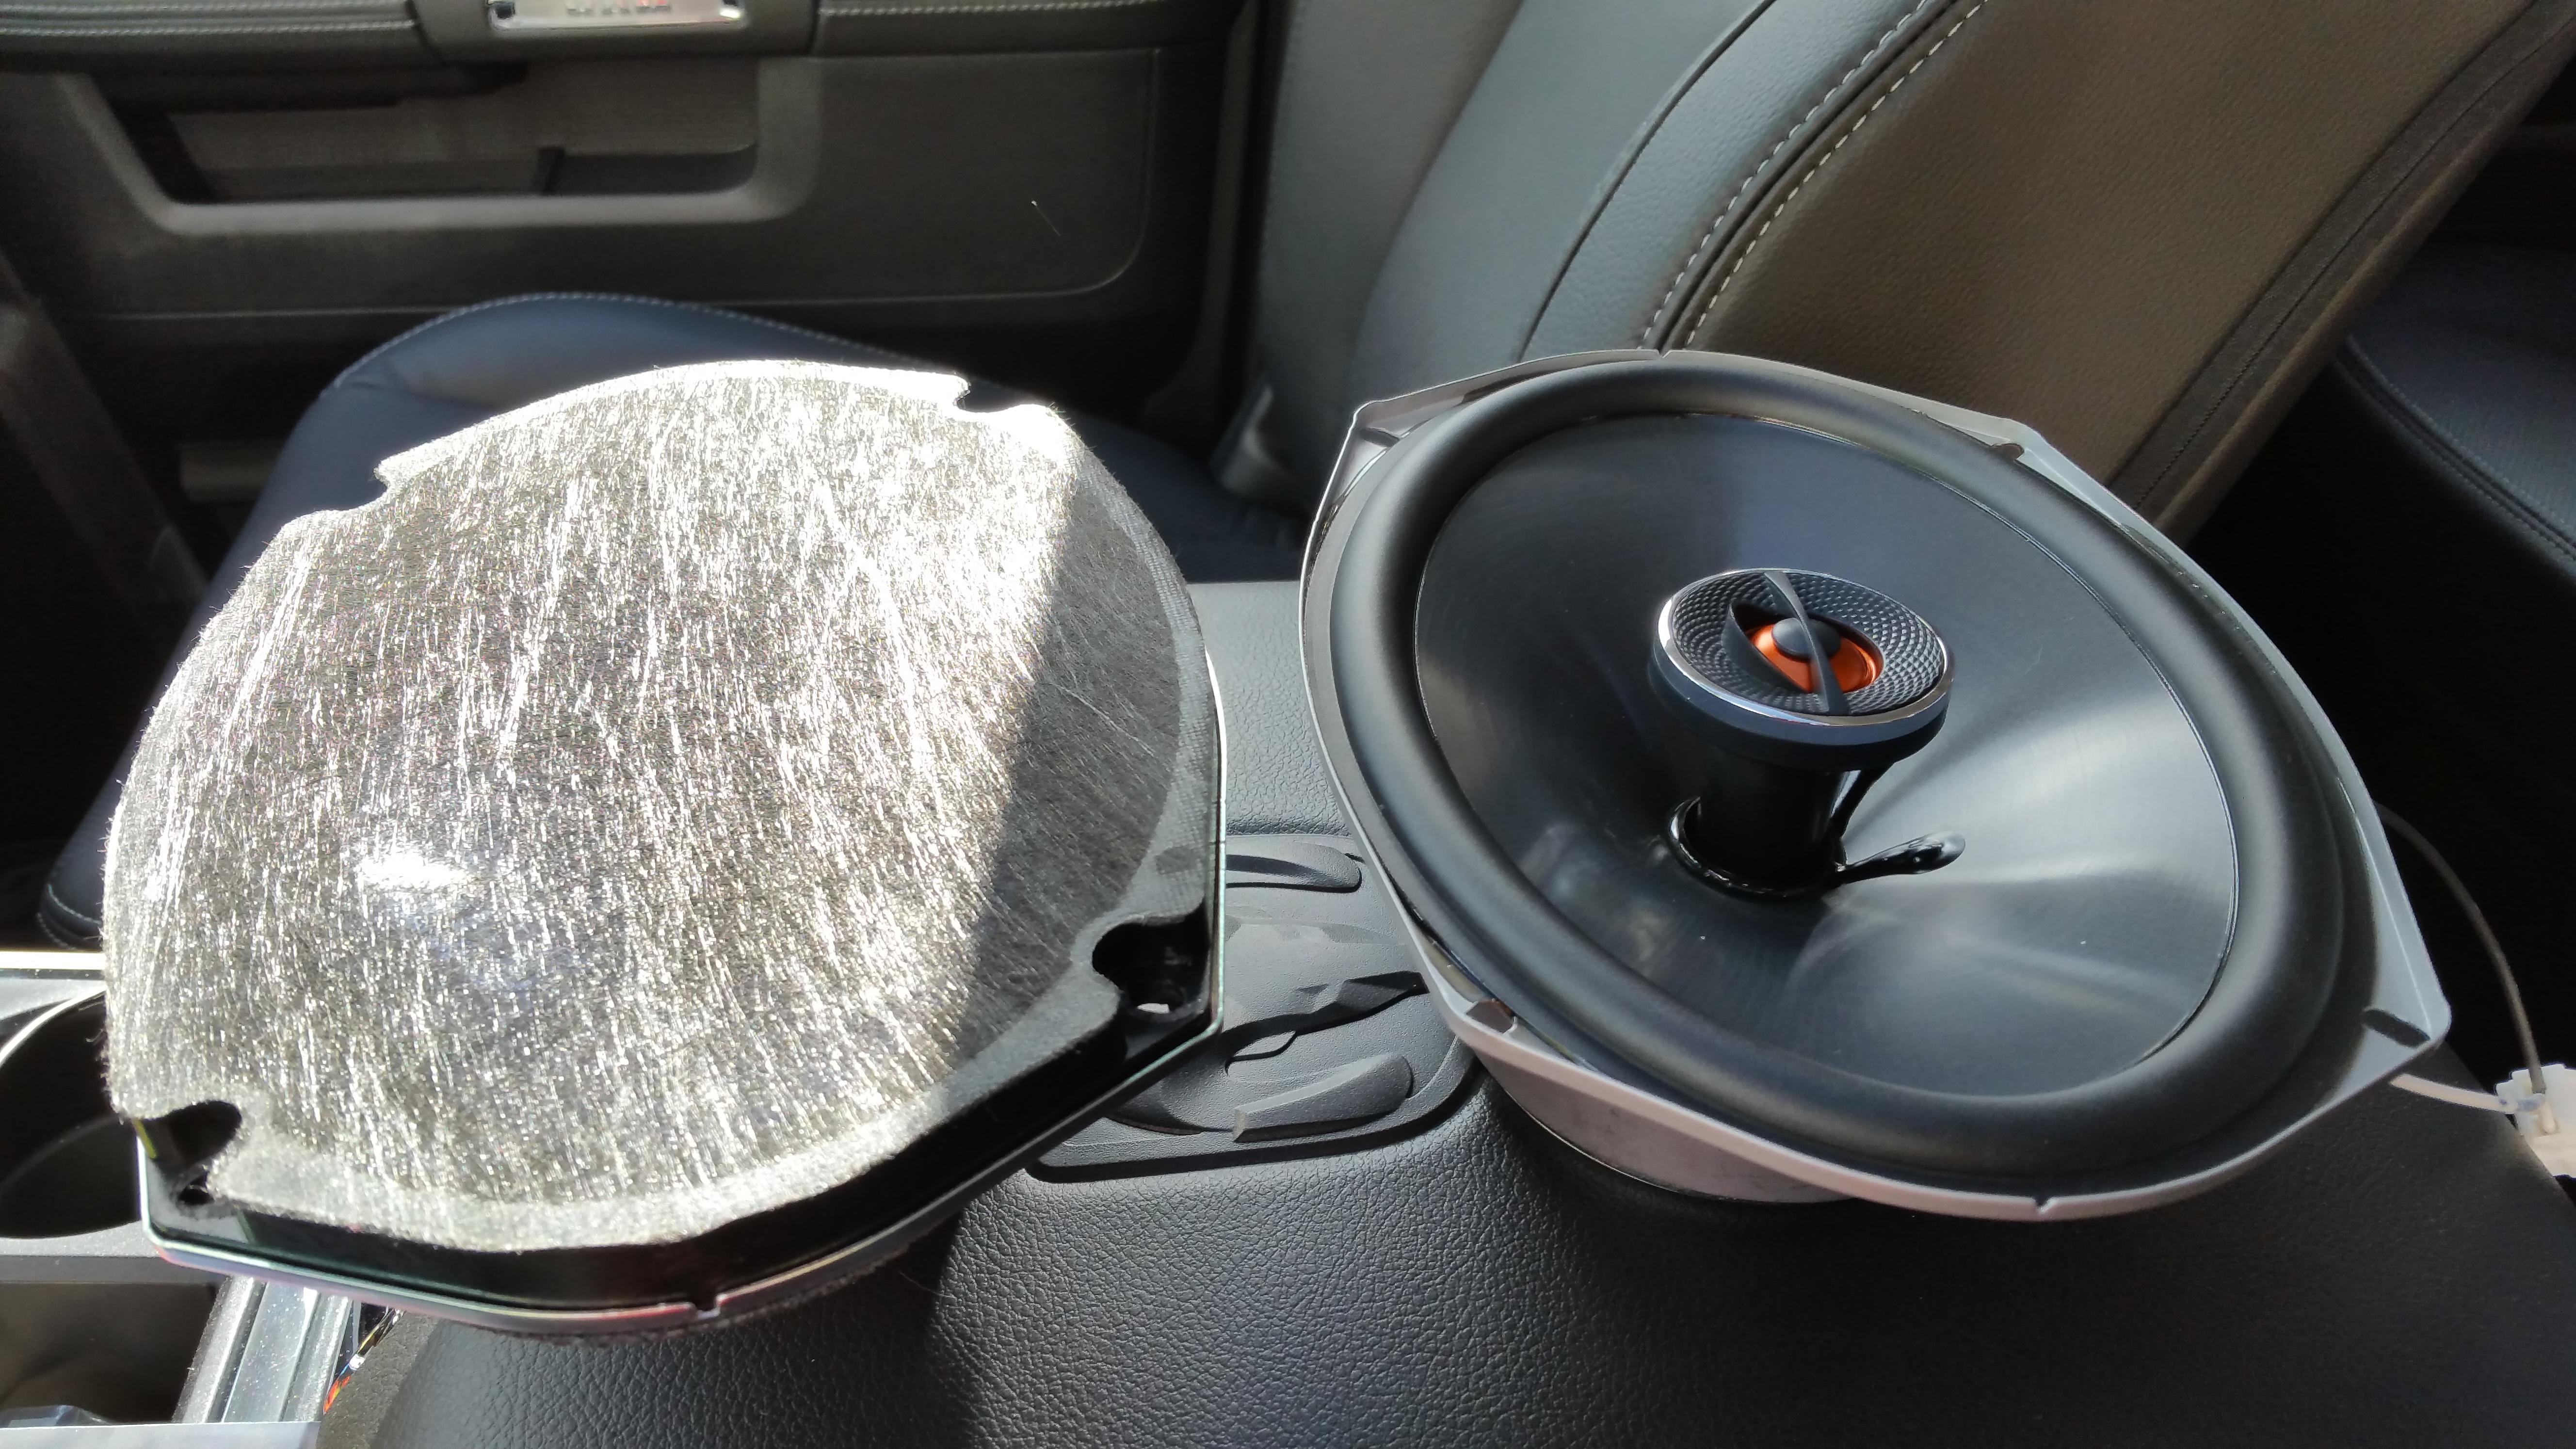 2016 Ram 1500 >> Alpine 8.4 Sound and Upgrade Speakers